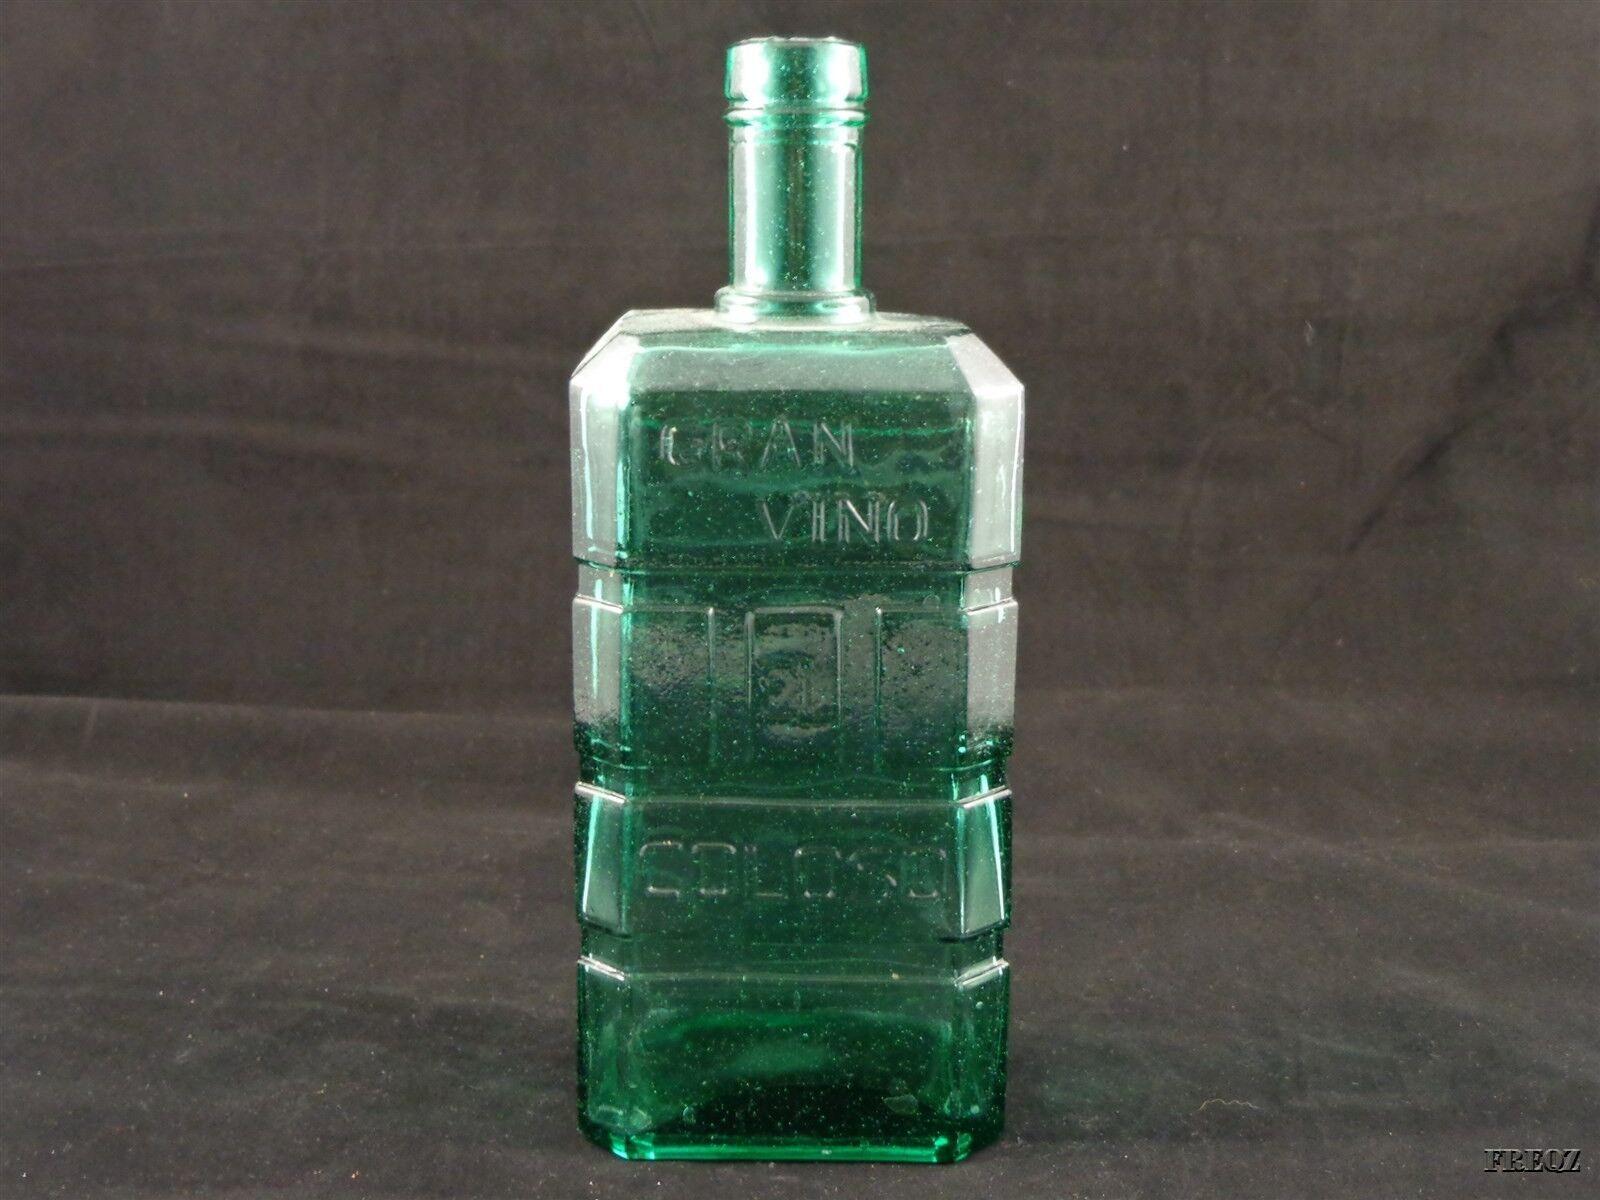 Gran Vino Coloso Green Liquor Bottle